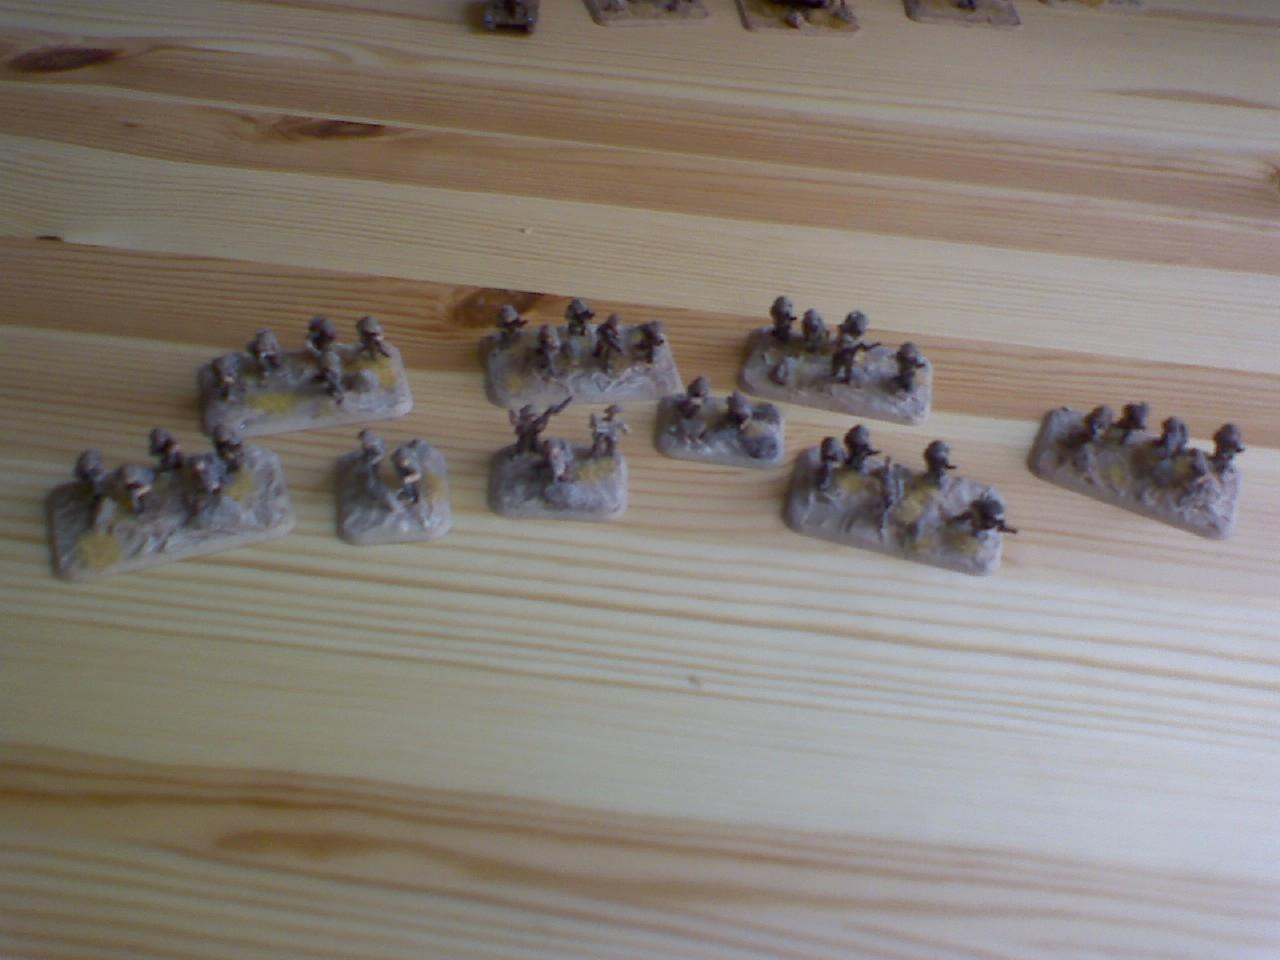 15mm, Anzac, British, Commonwealth, Desert, Flames Of War, Kiwi, Mid-war, New Zealand, North Africa, Rifle Platoon, World War 2